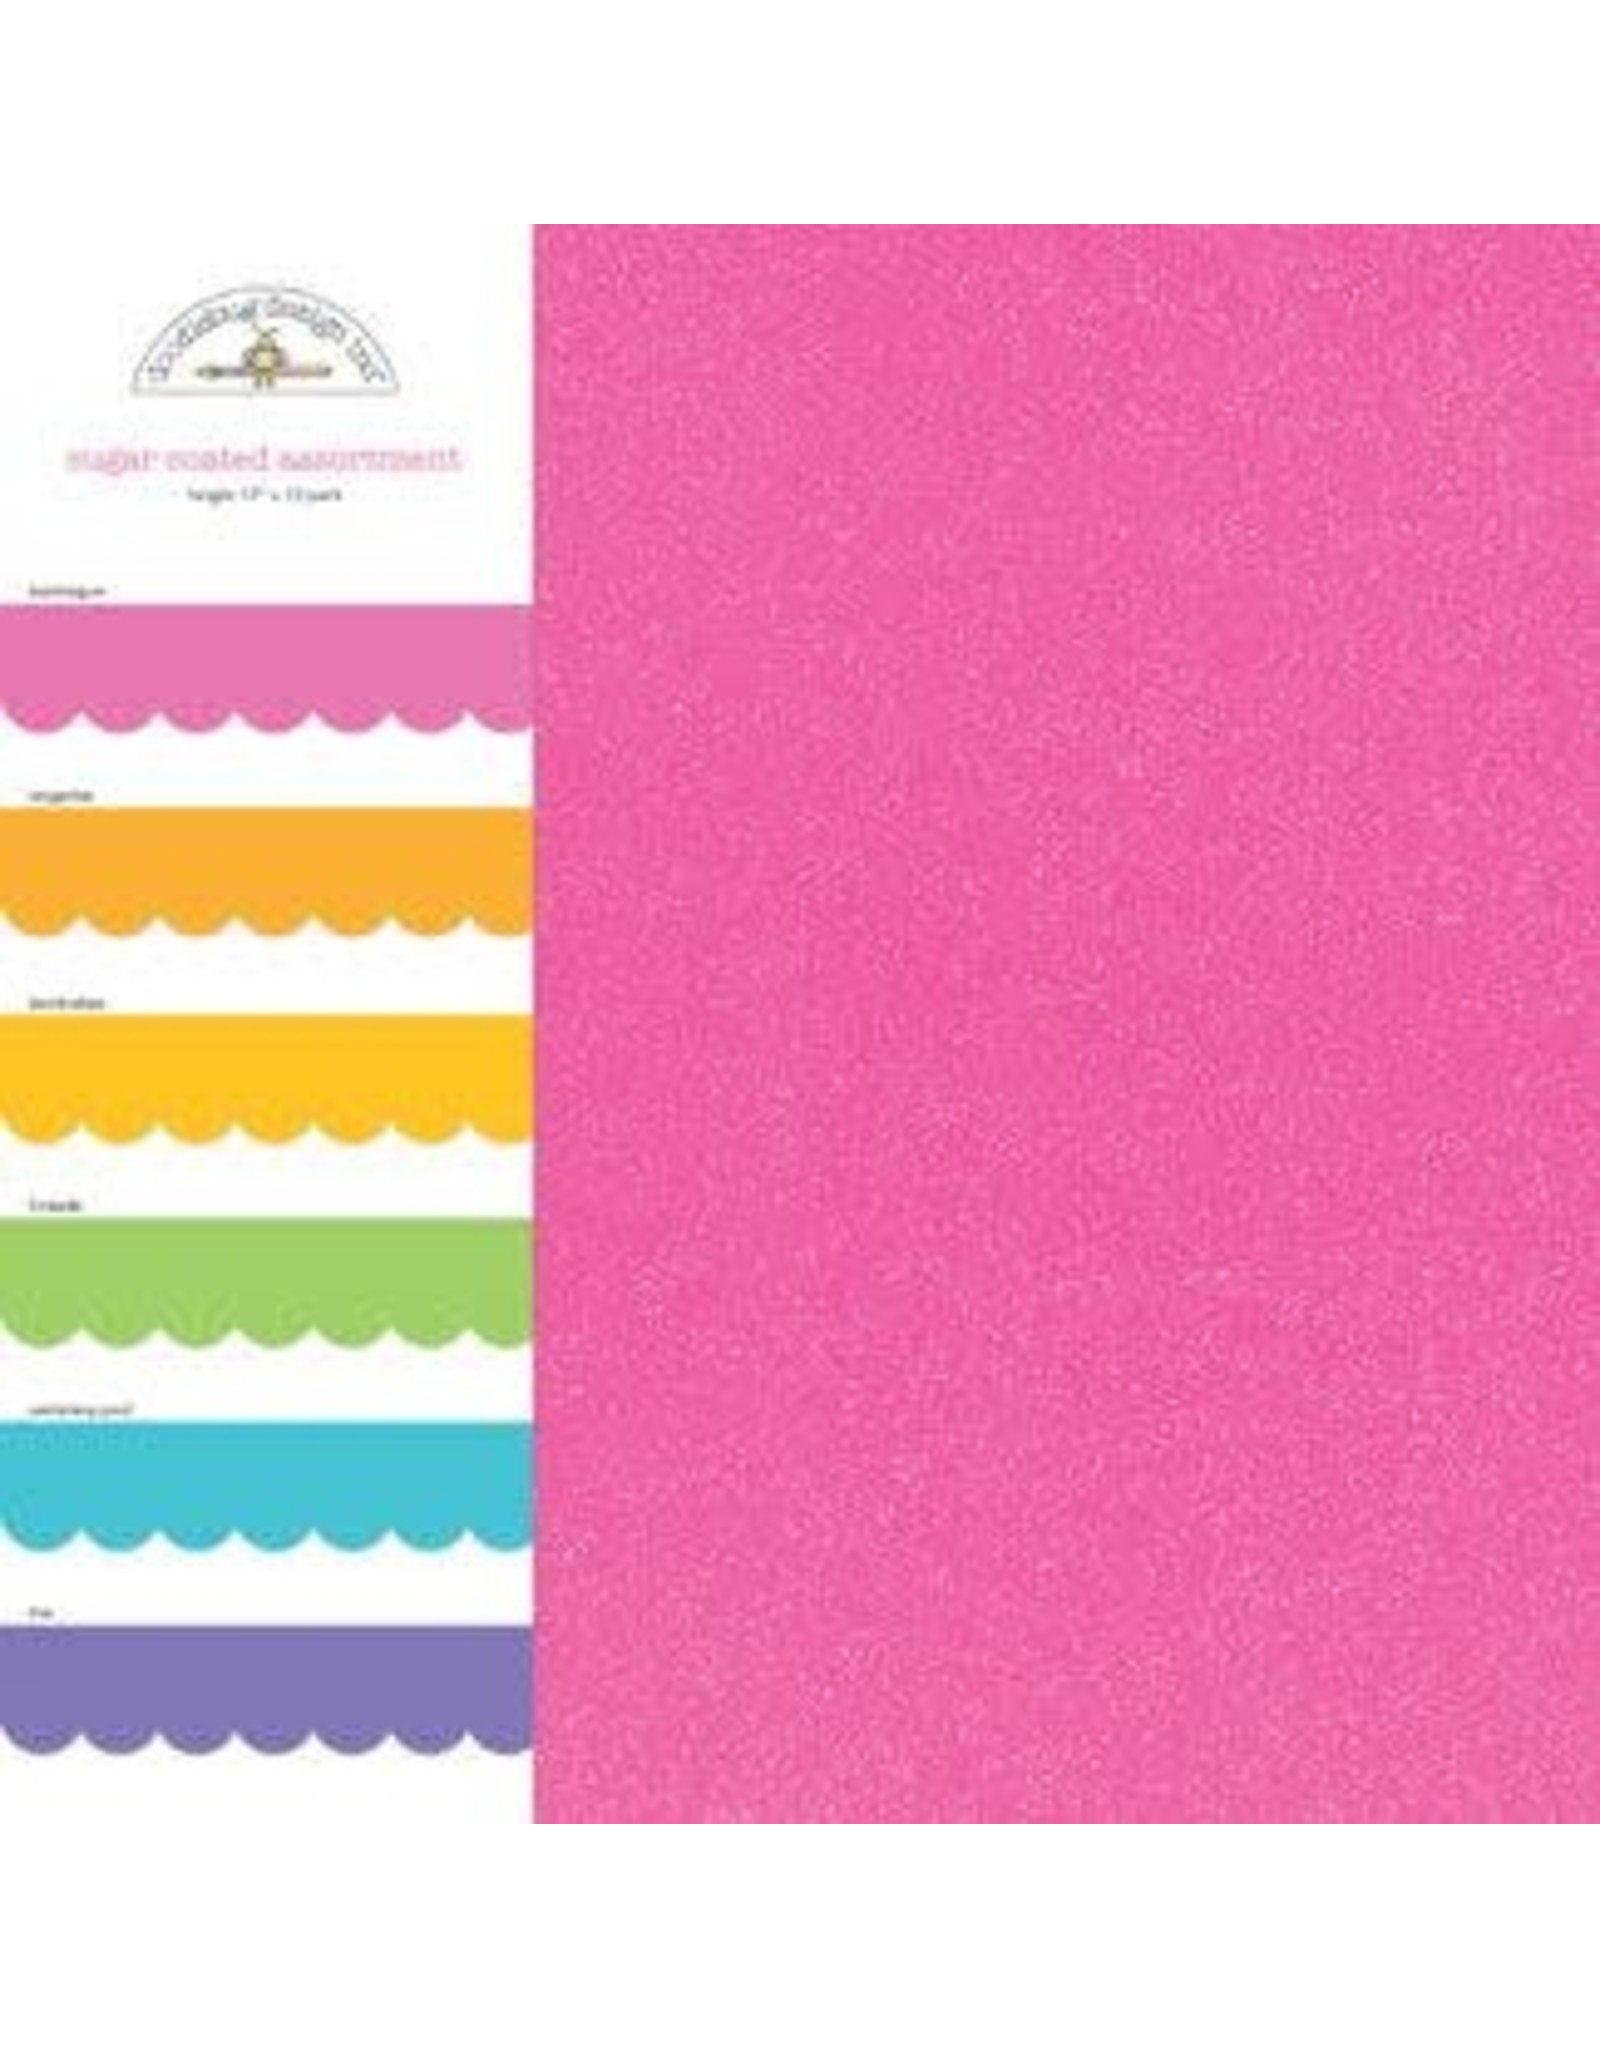 Doodlebug Design 12x12 bright sugar coated assortment pack